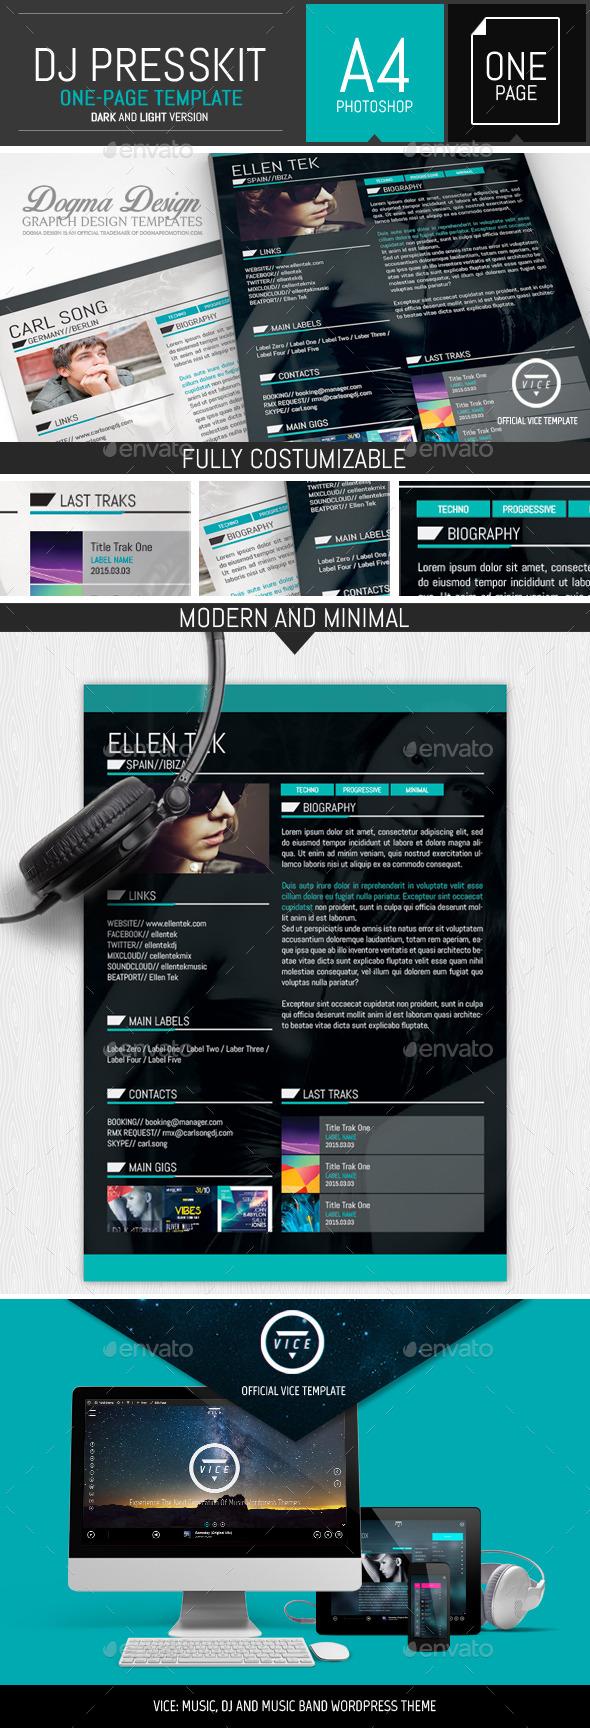 Vice: Dj / Musician OnePage Resume PSD Template by DogmaDesign ...